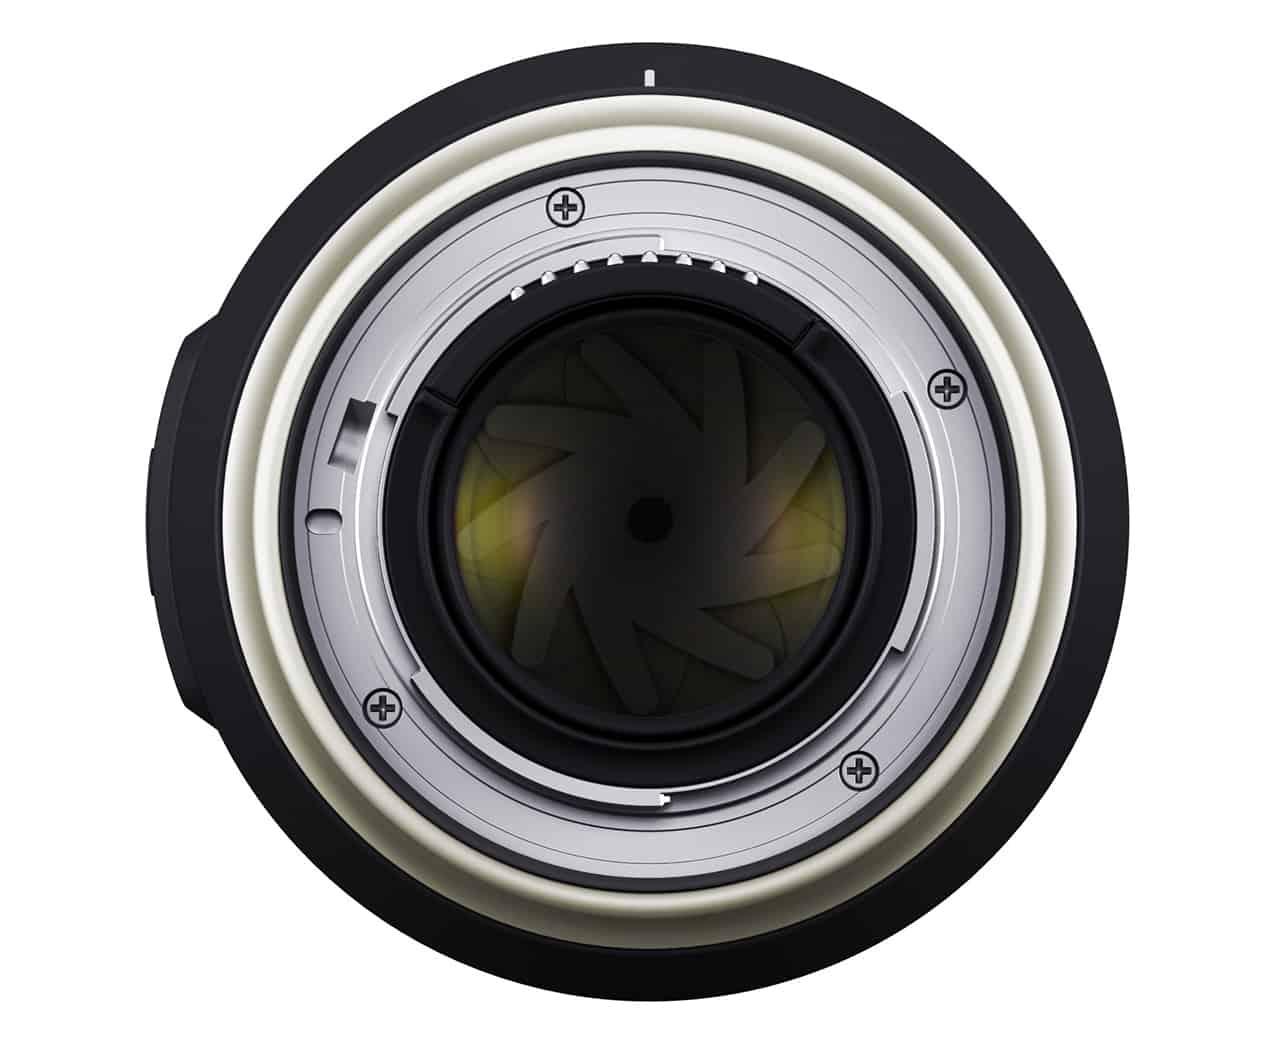 Tamron SP 35 mm F1.4